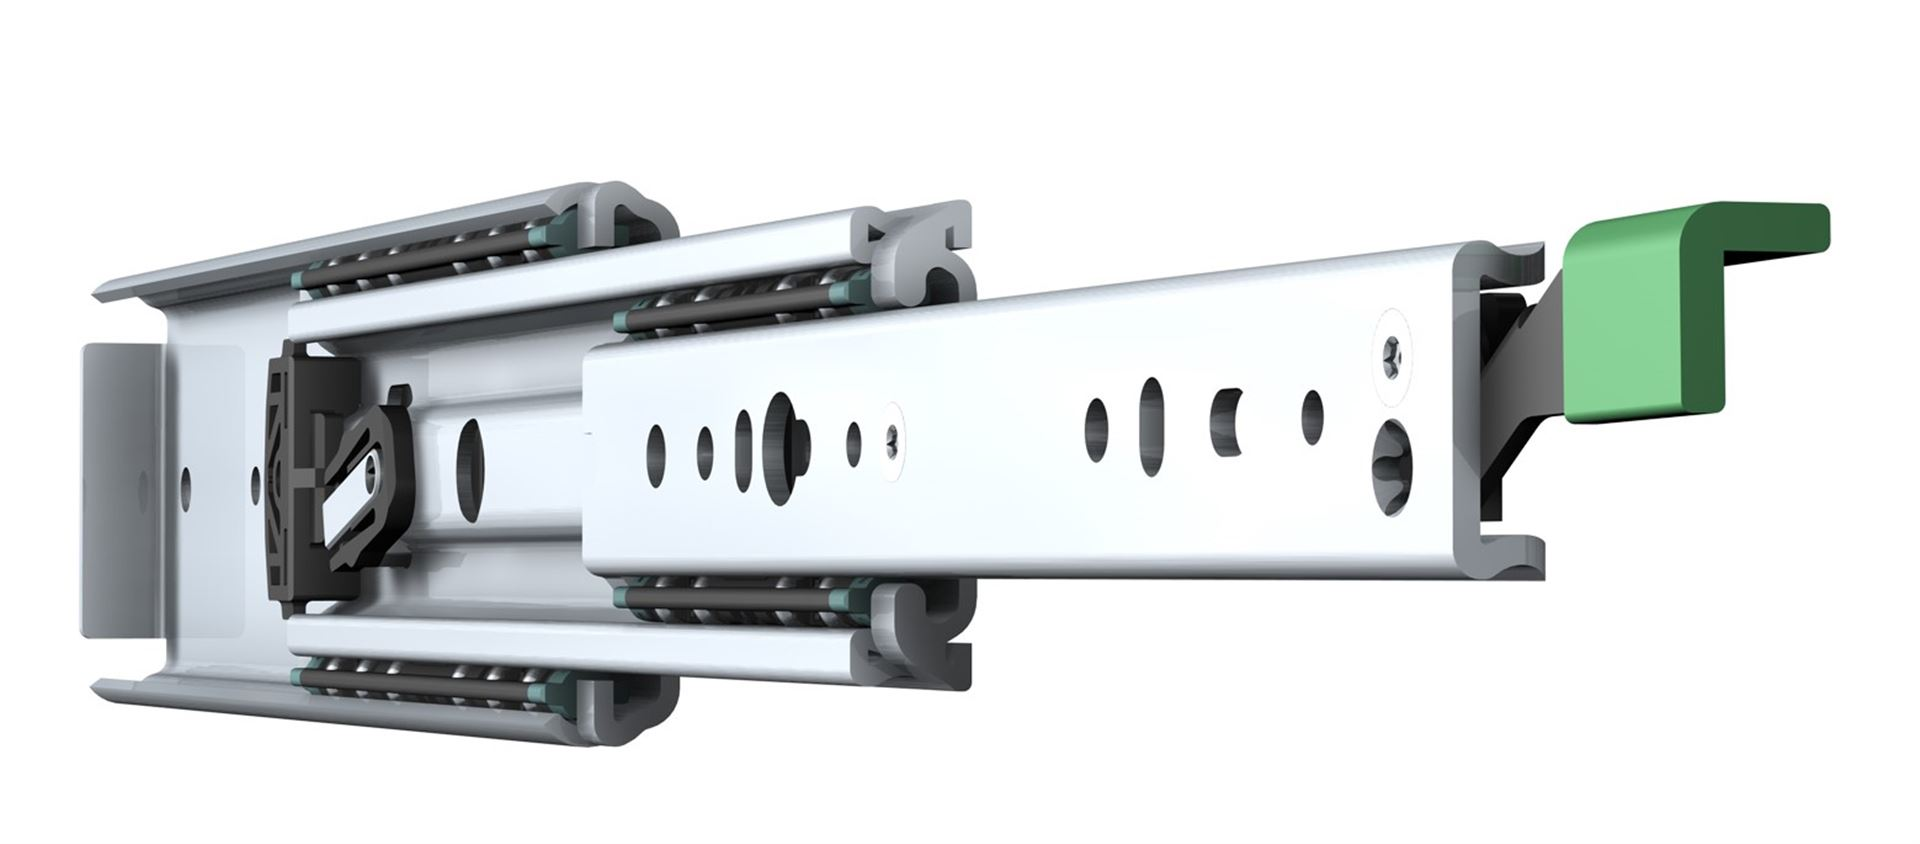 New design - Jumbo TR - 7619